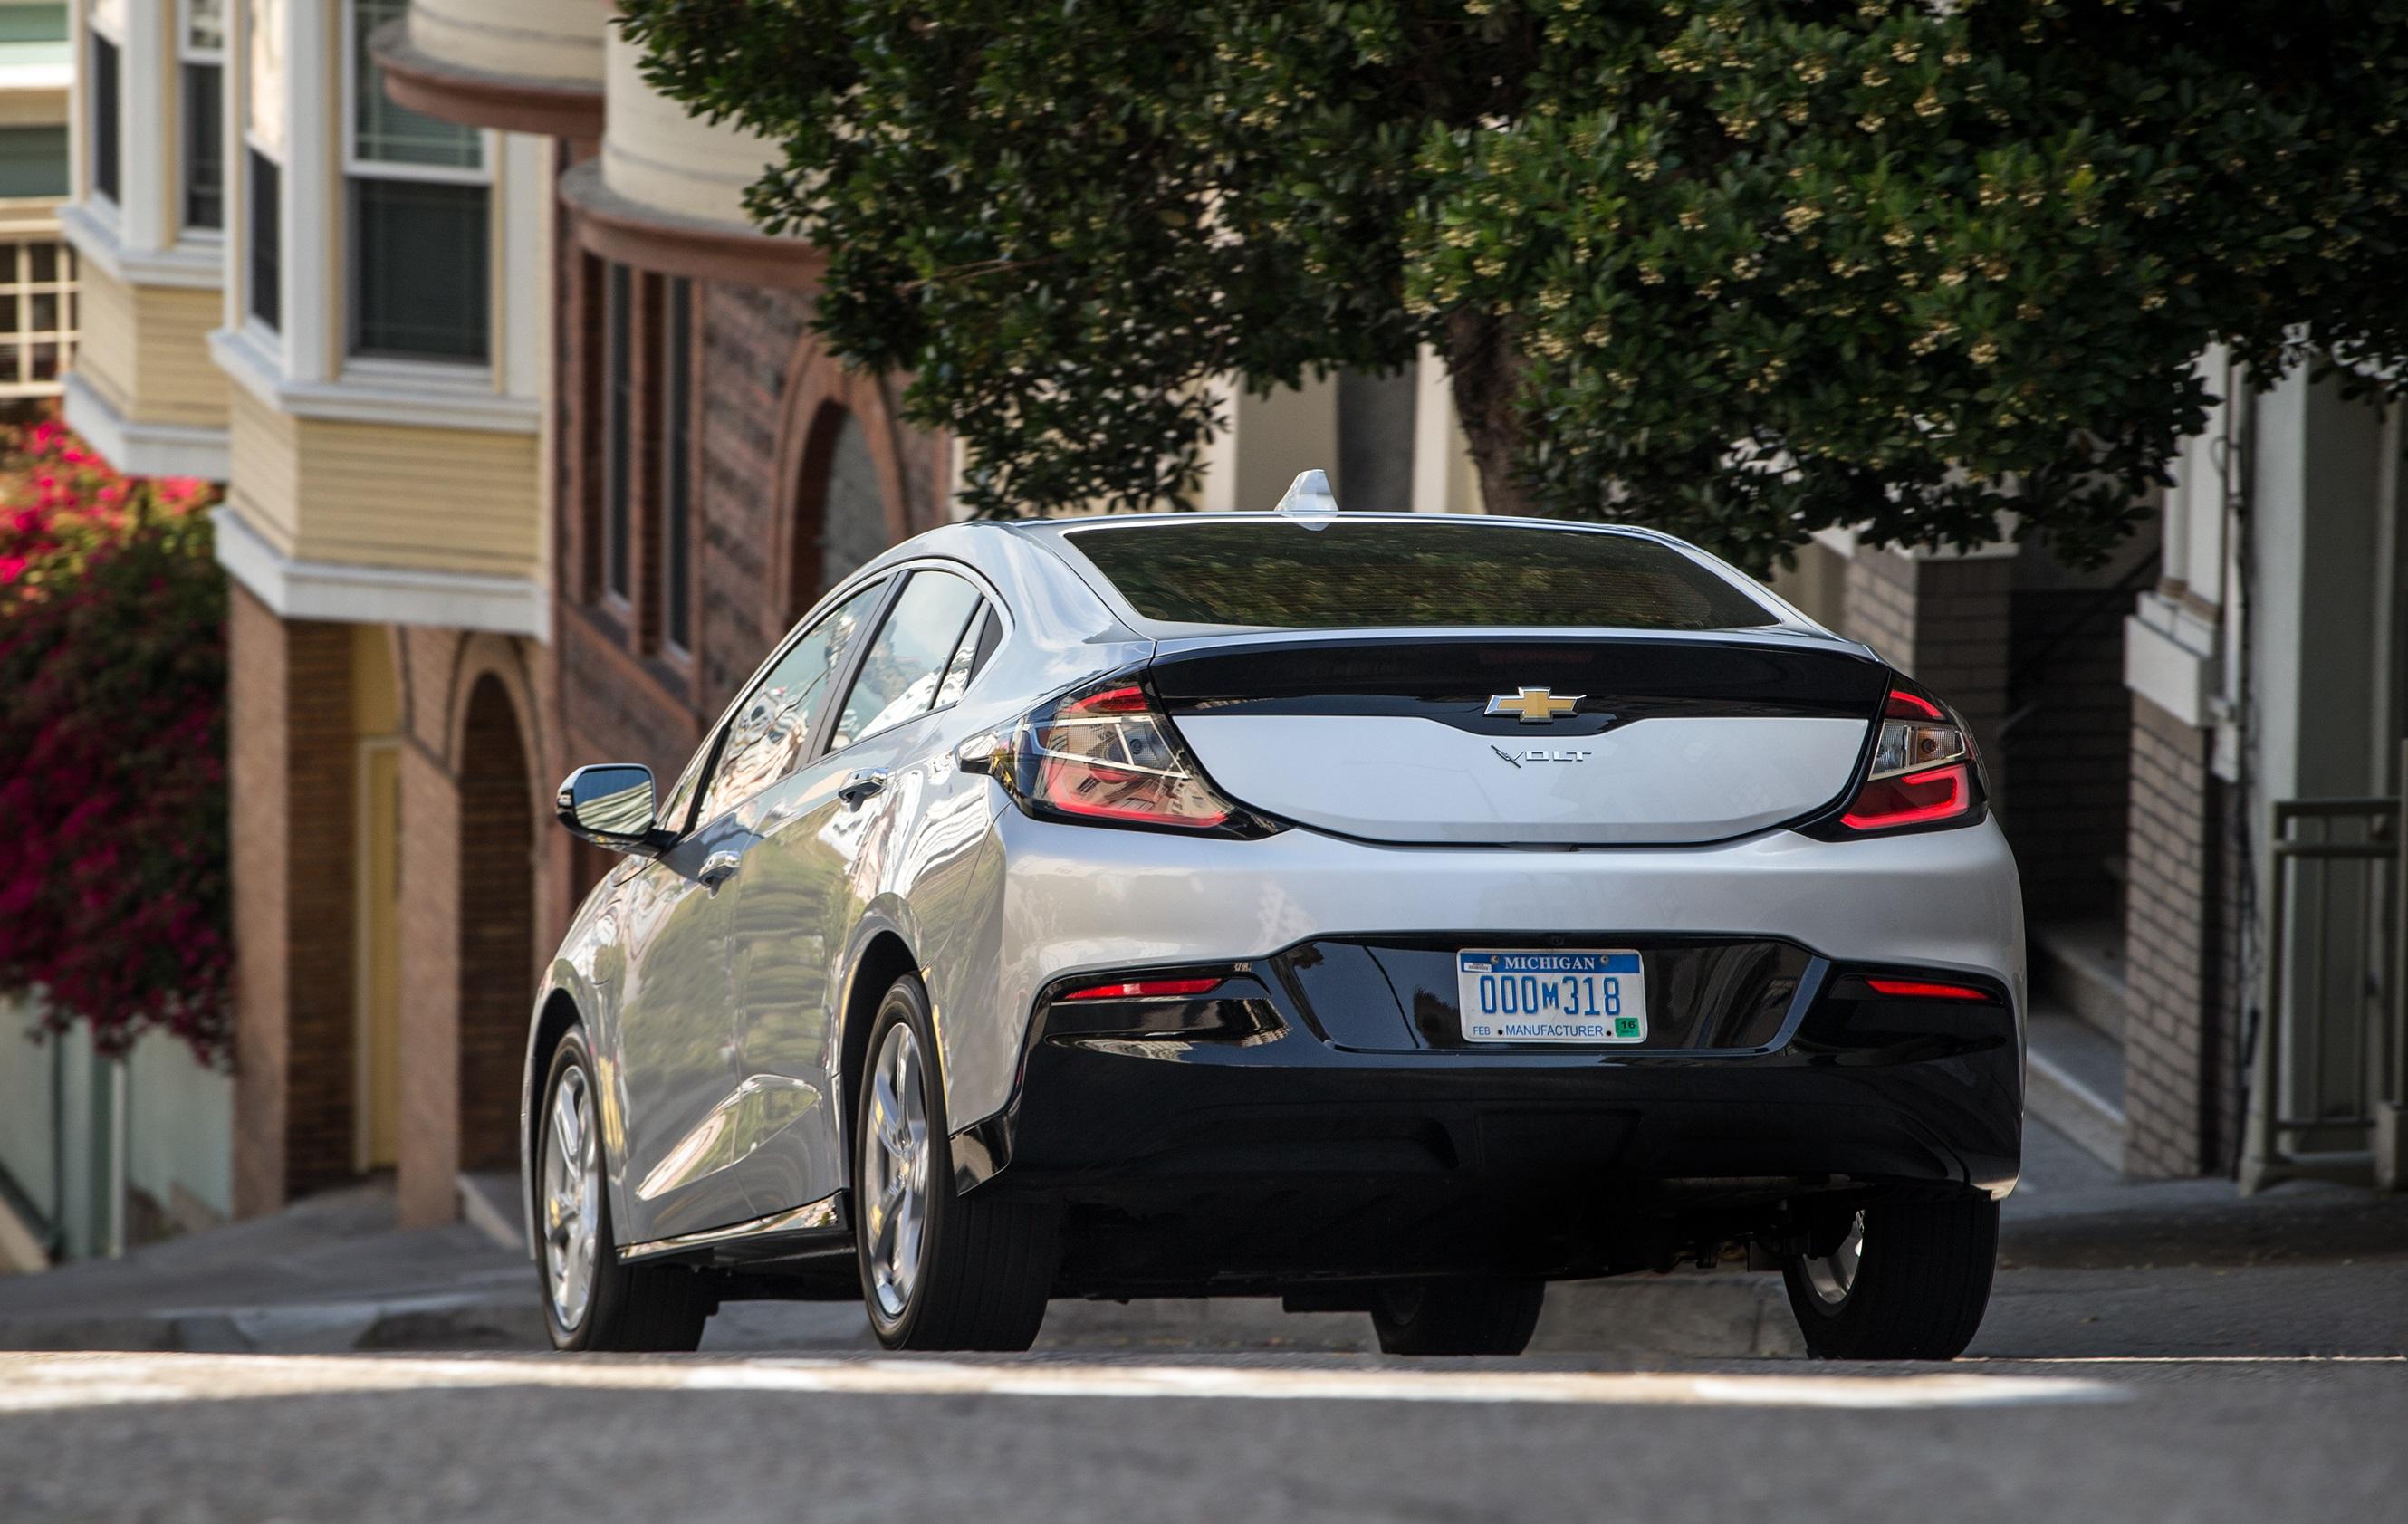 General Motors will start testing self-driving cars on Manhattan streets in 2018